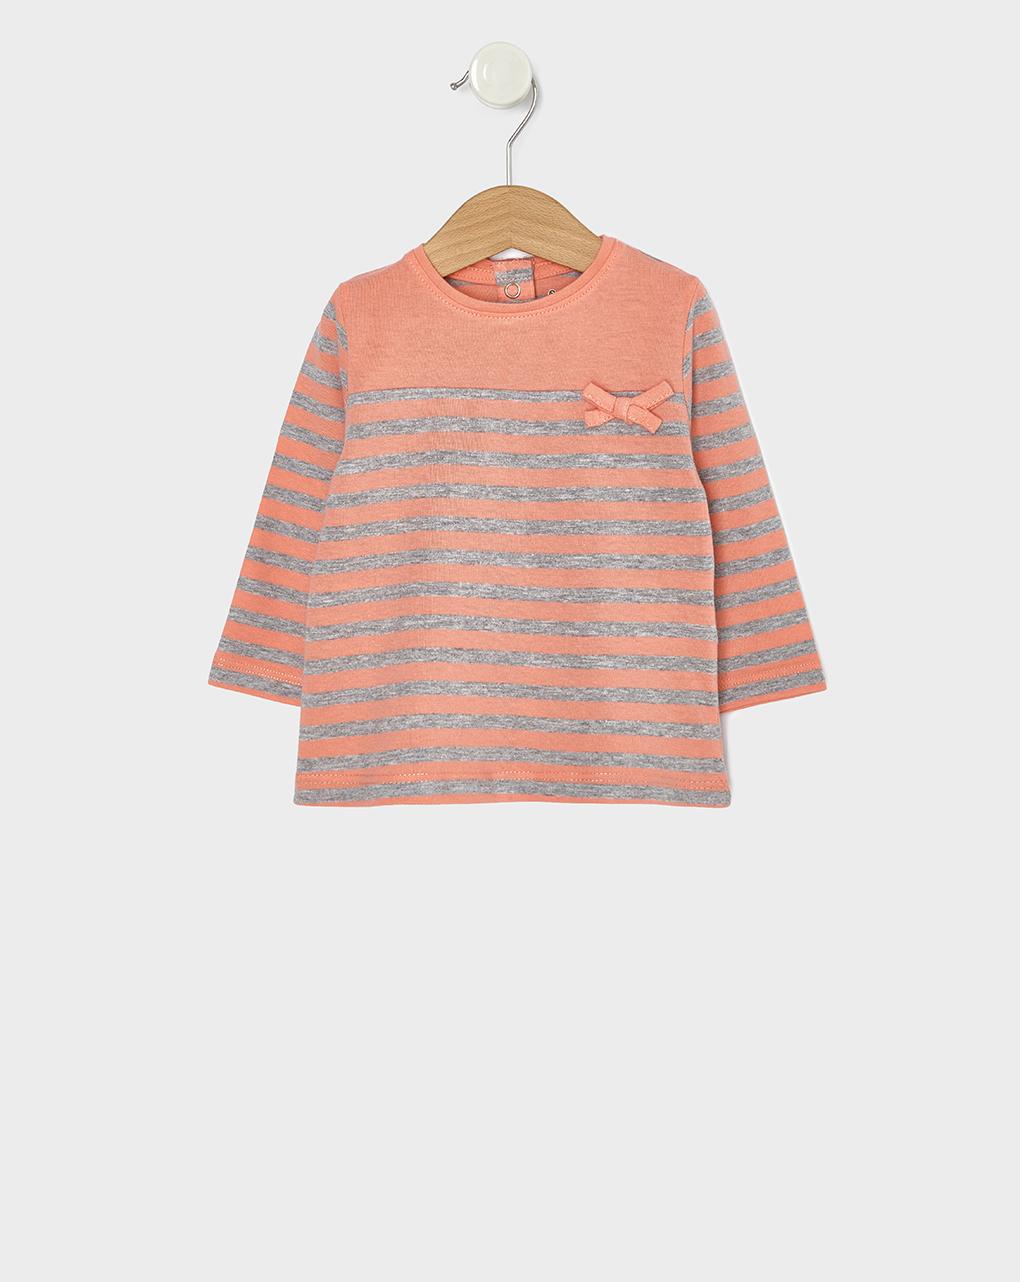 T-shirt Βasic Ριγέ Σομόν για Κορίτσι